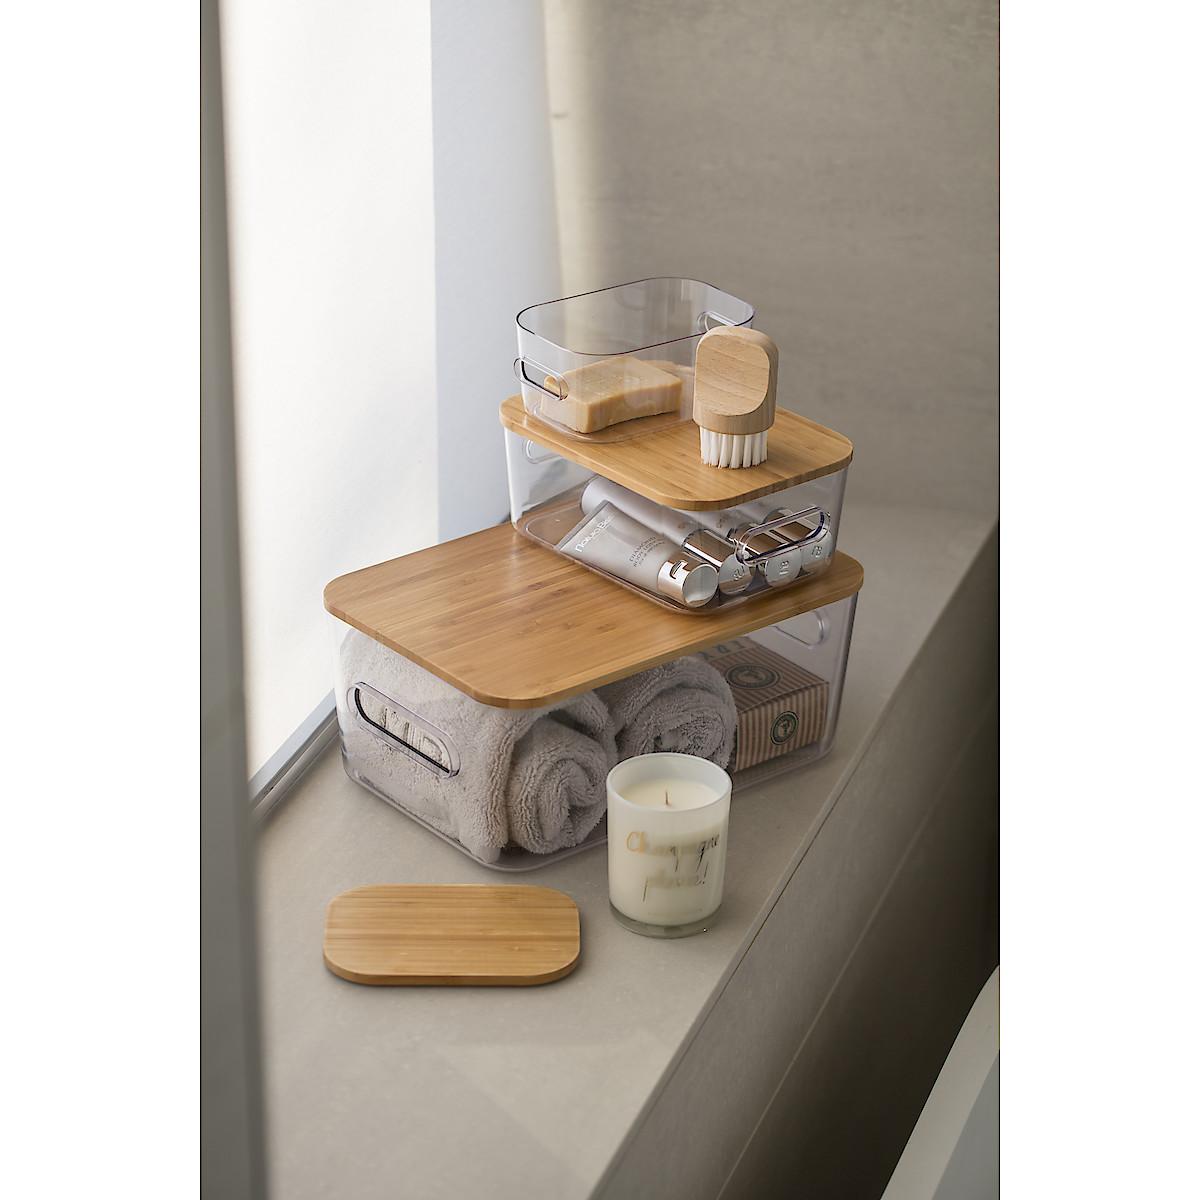 Full Size of Aufbewahrungsbehlter Smartstore Compact Clear Clas Ohlson Aufbewahrungsbehälter Küche Wohnzimmer Aufbewahrungsbehälter